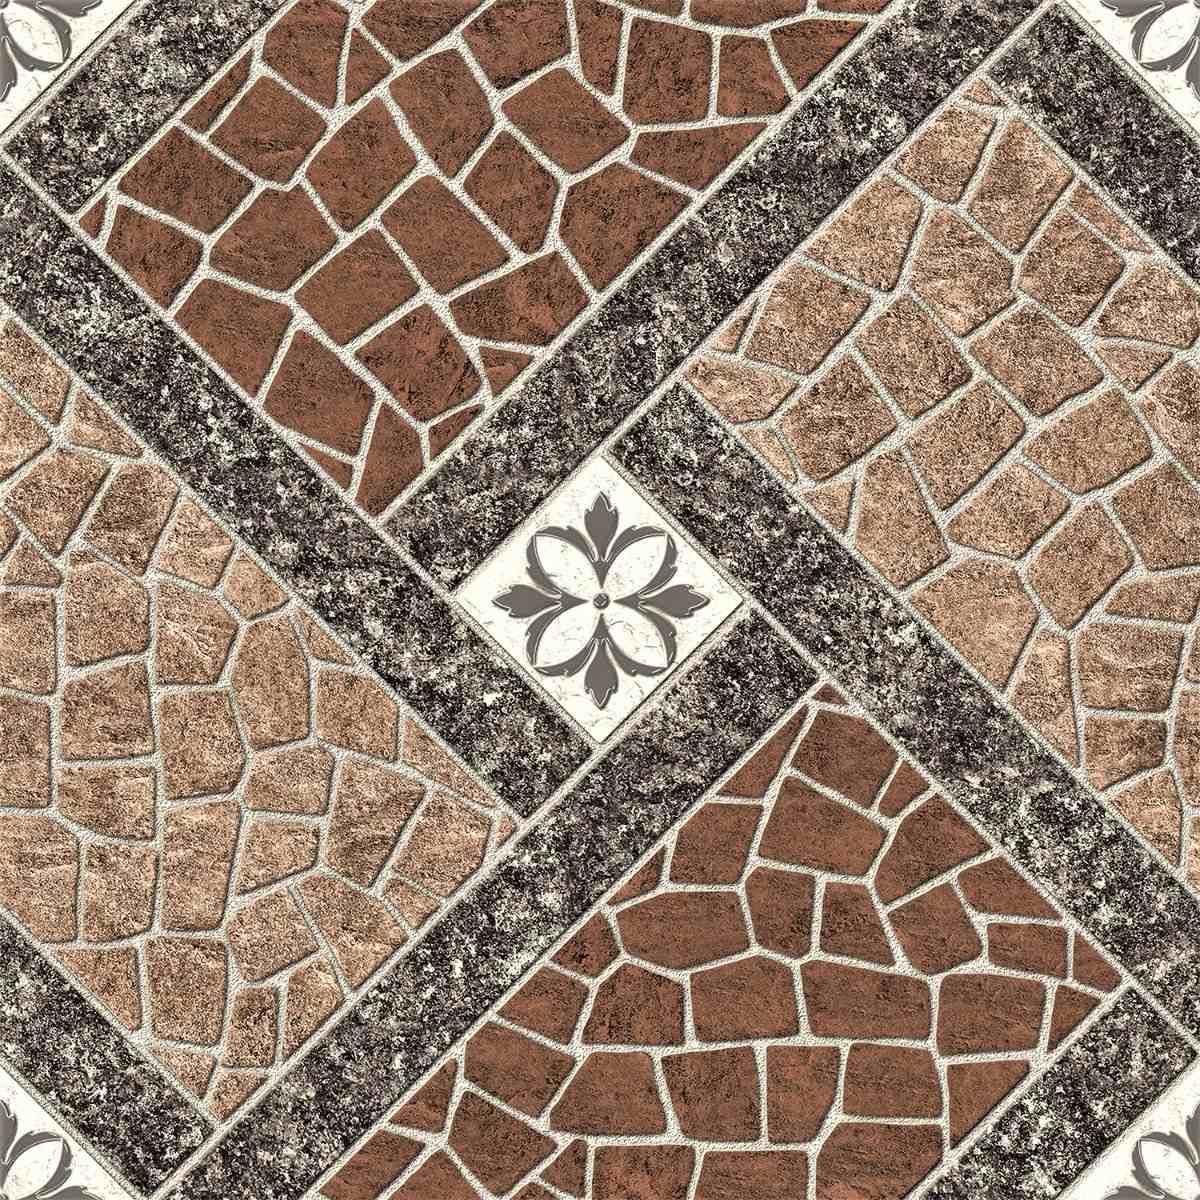 Ceramica Rustica 45x45 Exterior 290 00 En Mercado Libre